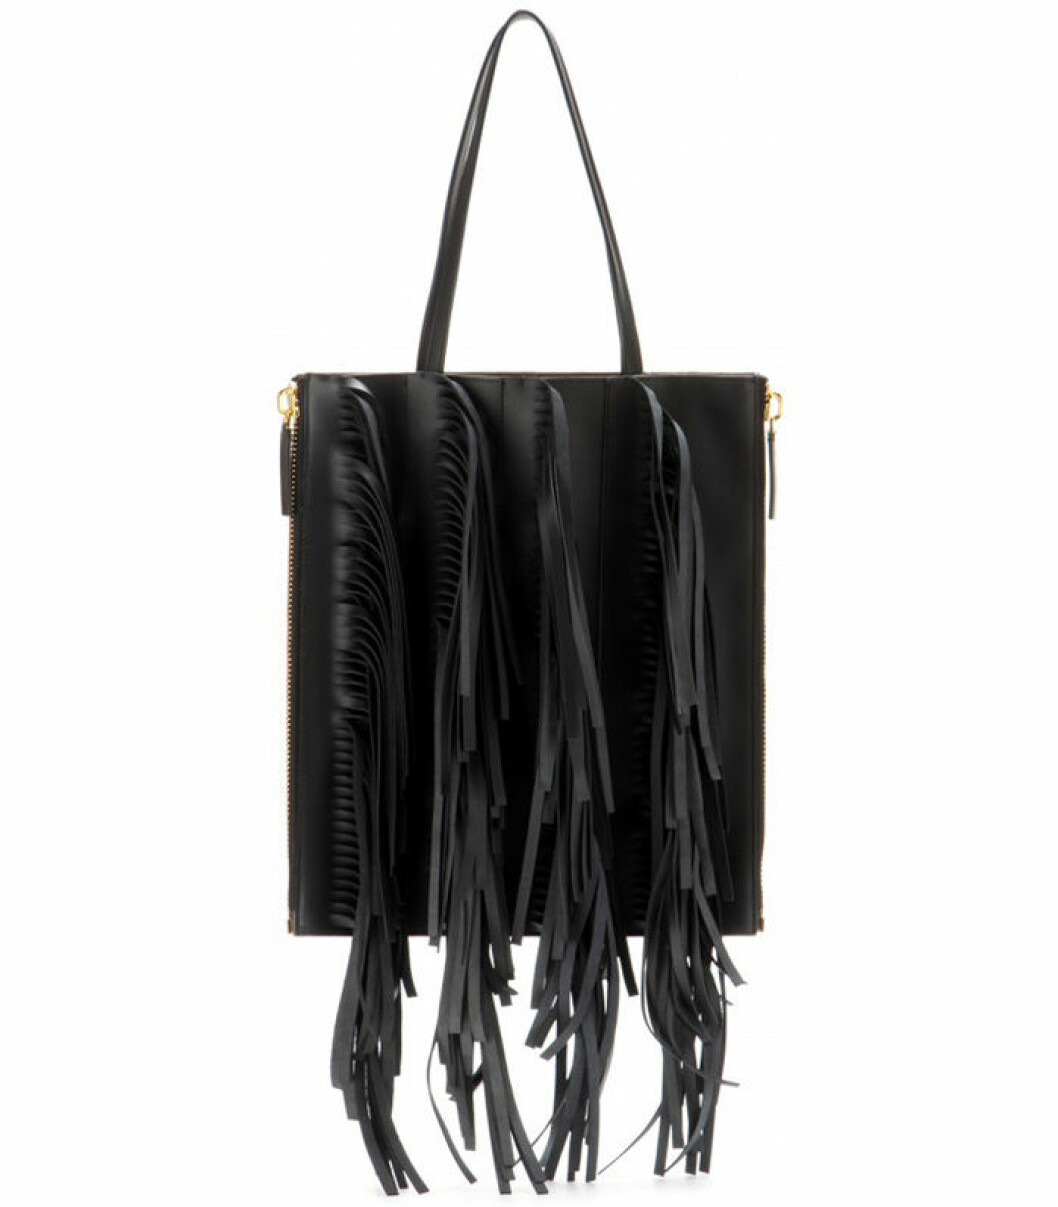 9. Väska, 8503 kr, Marni Mytheresa.com